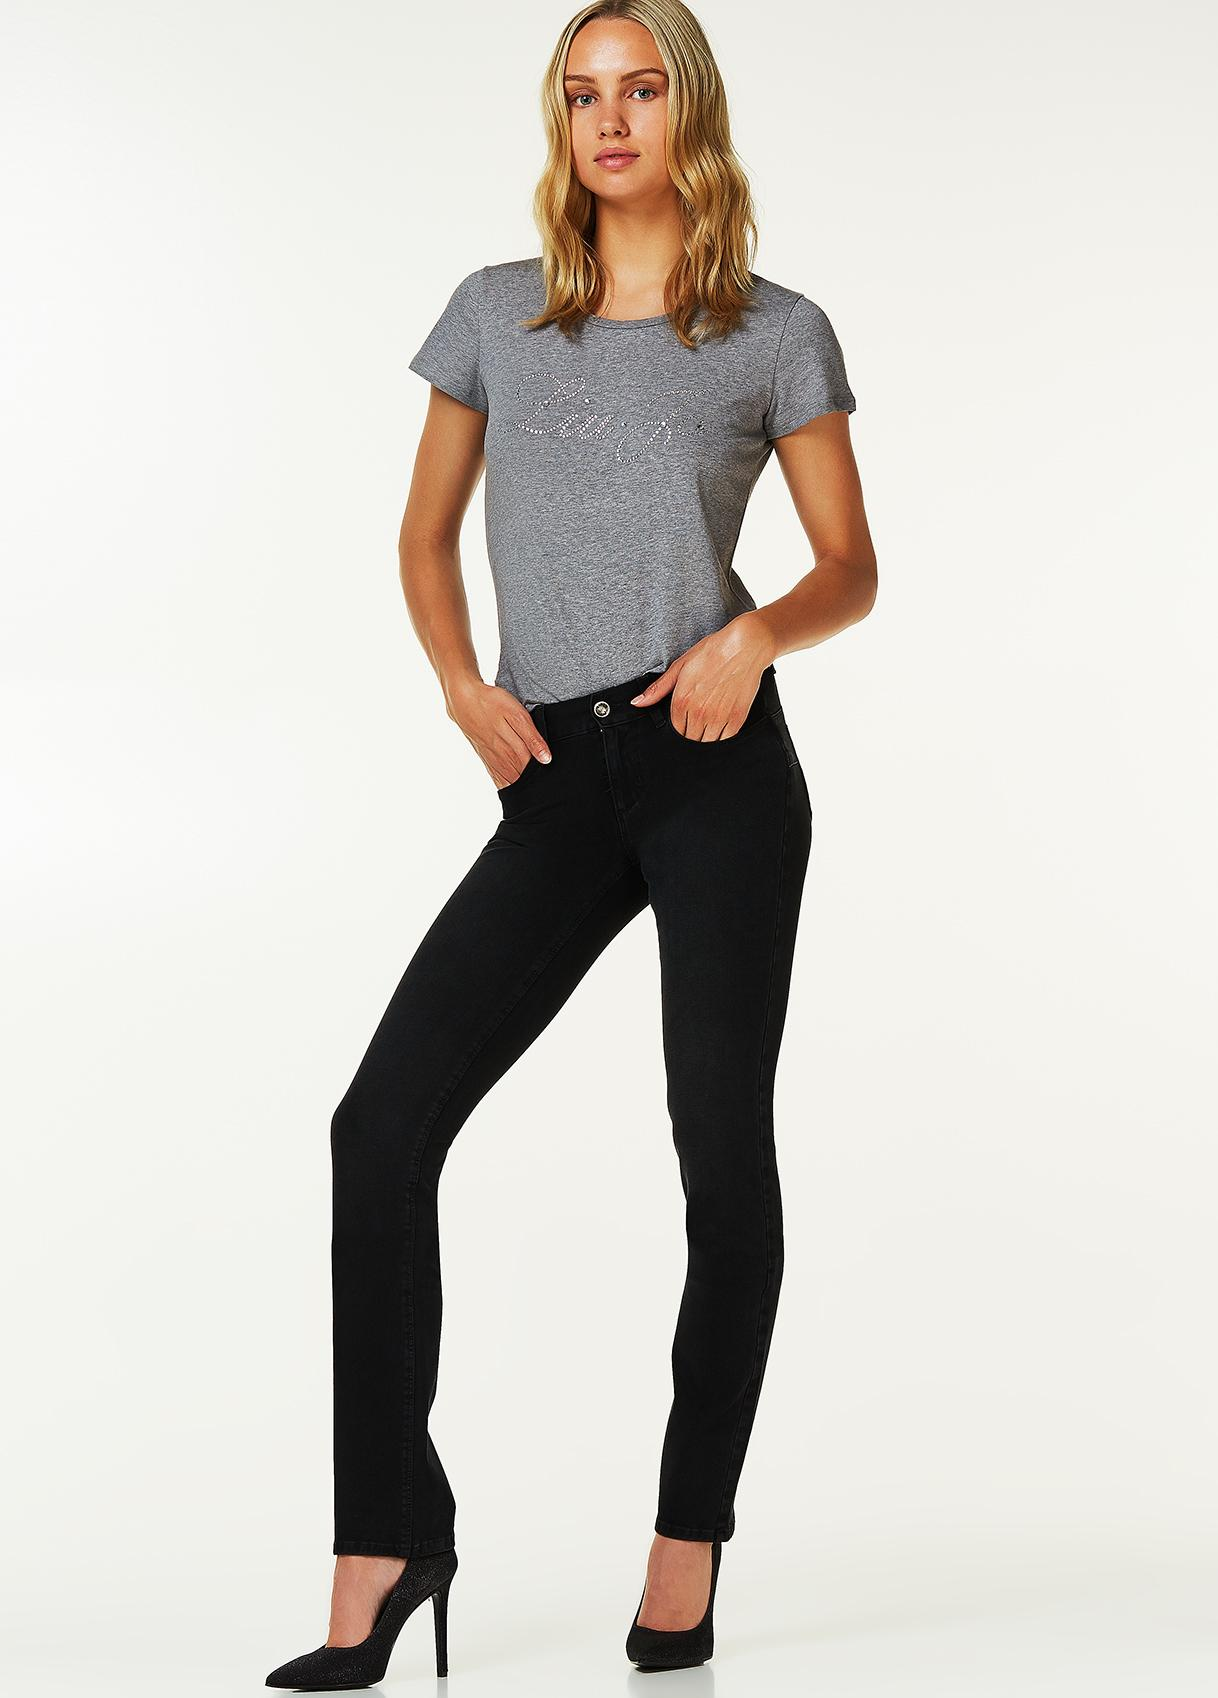 8052047716989-jeans-straight-U67008D416687174-I-AO-N-B-01_1